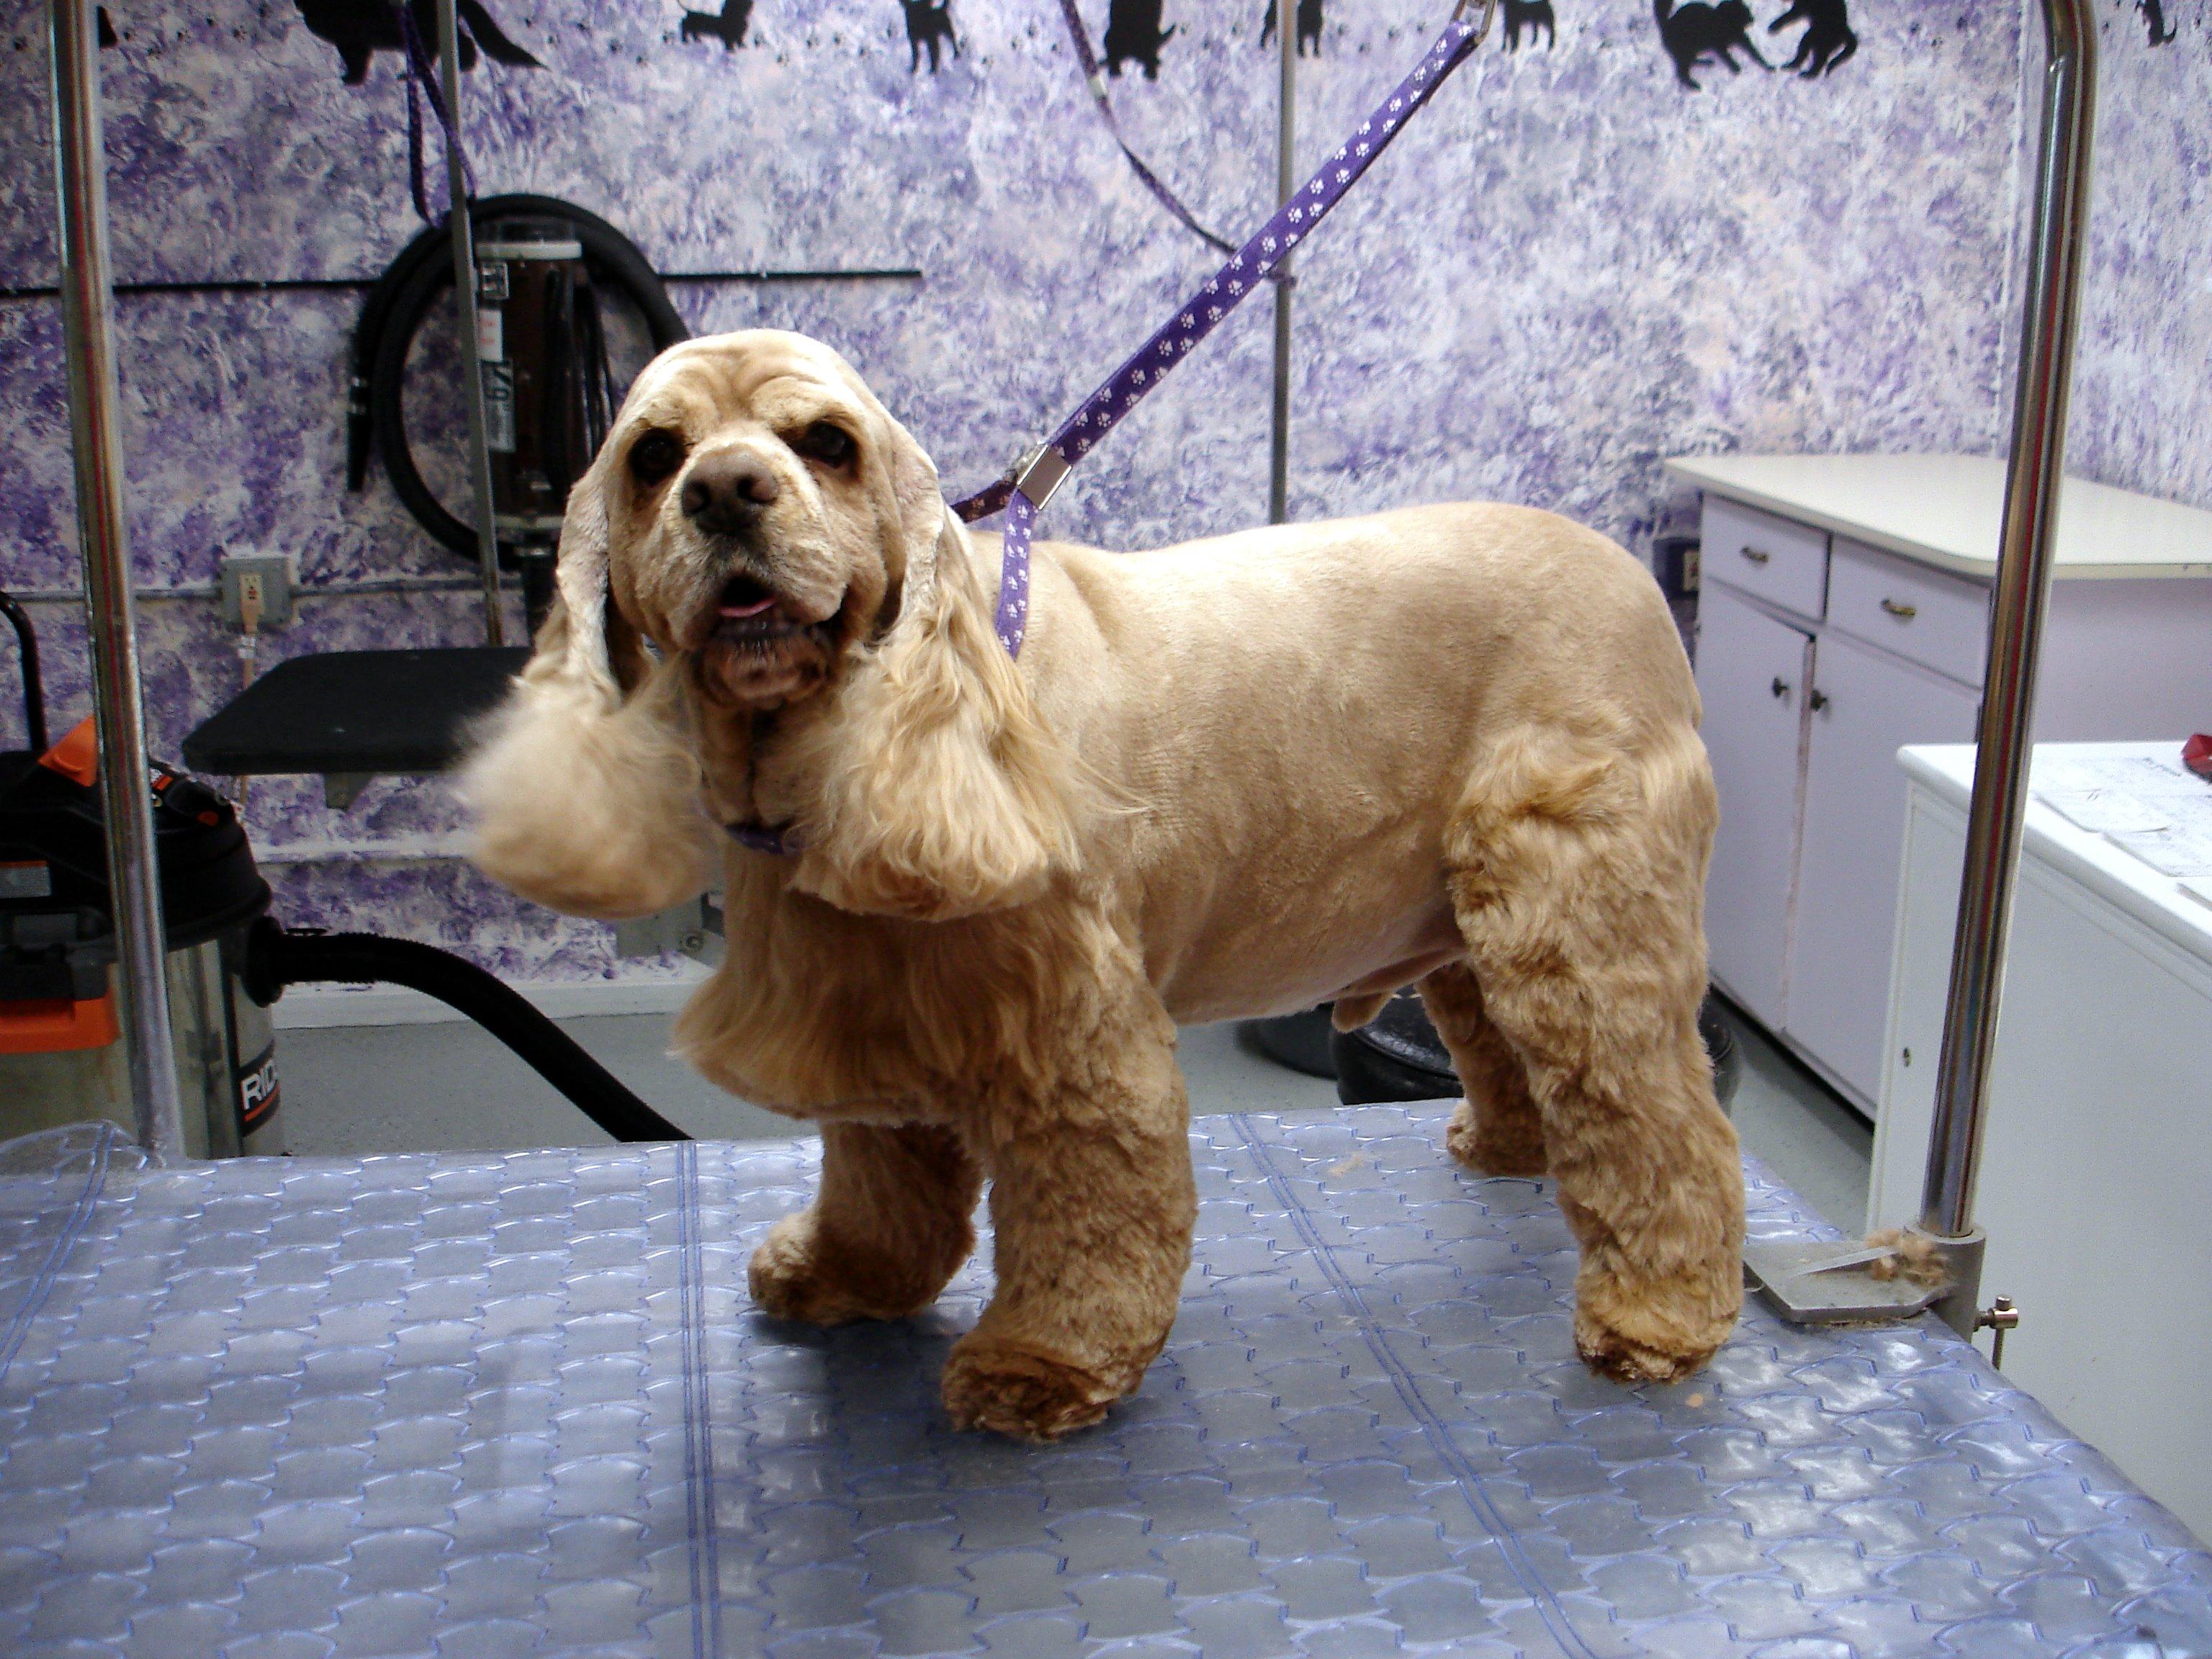 American Dog Grooming School Okc